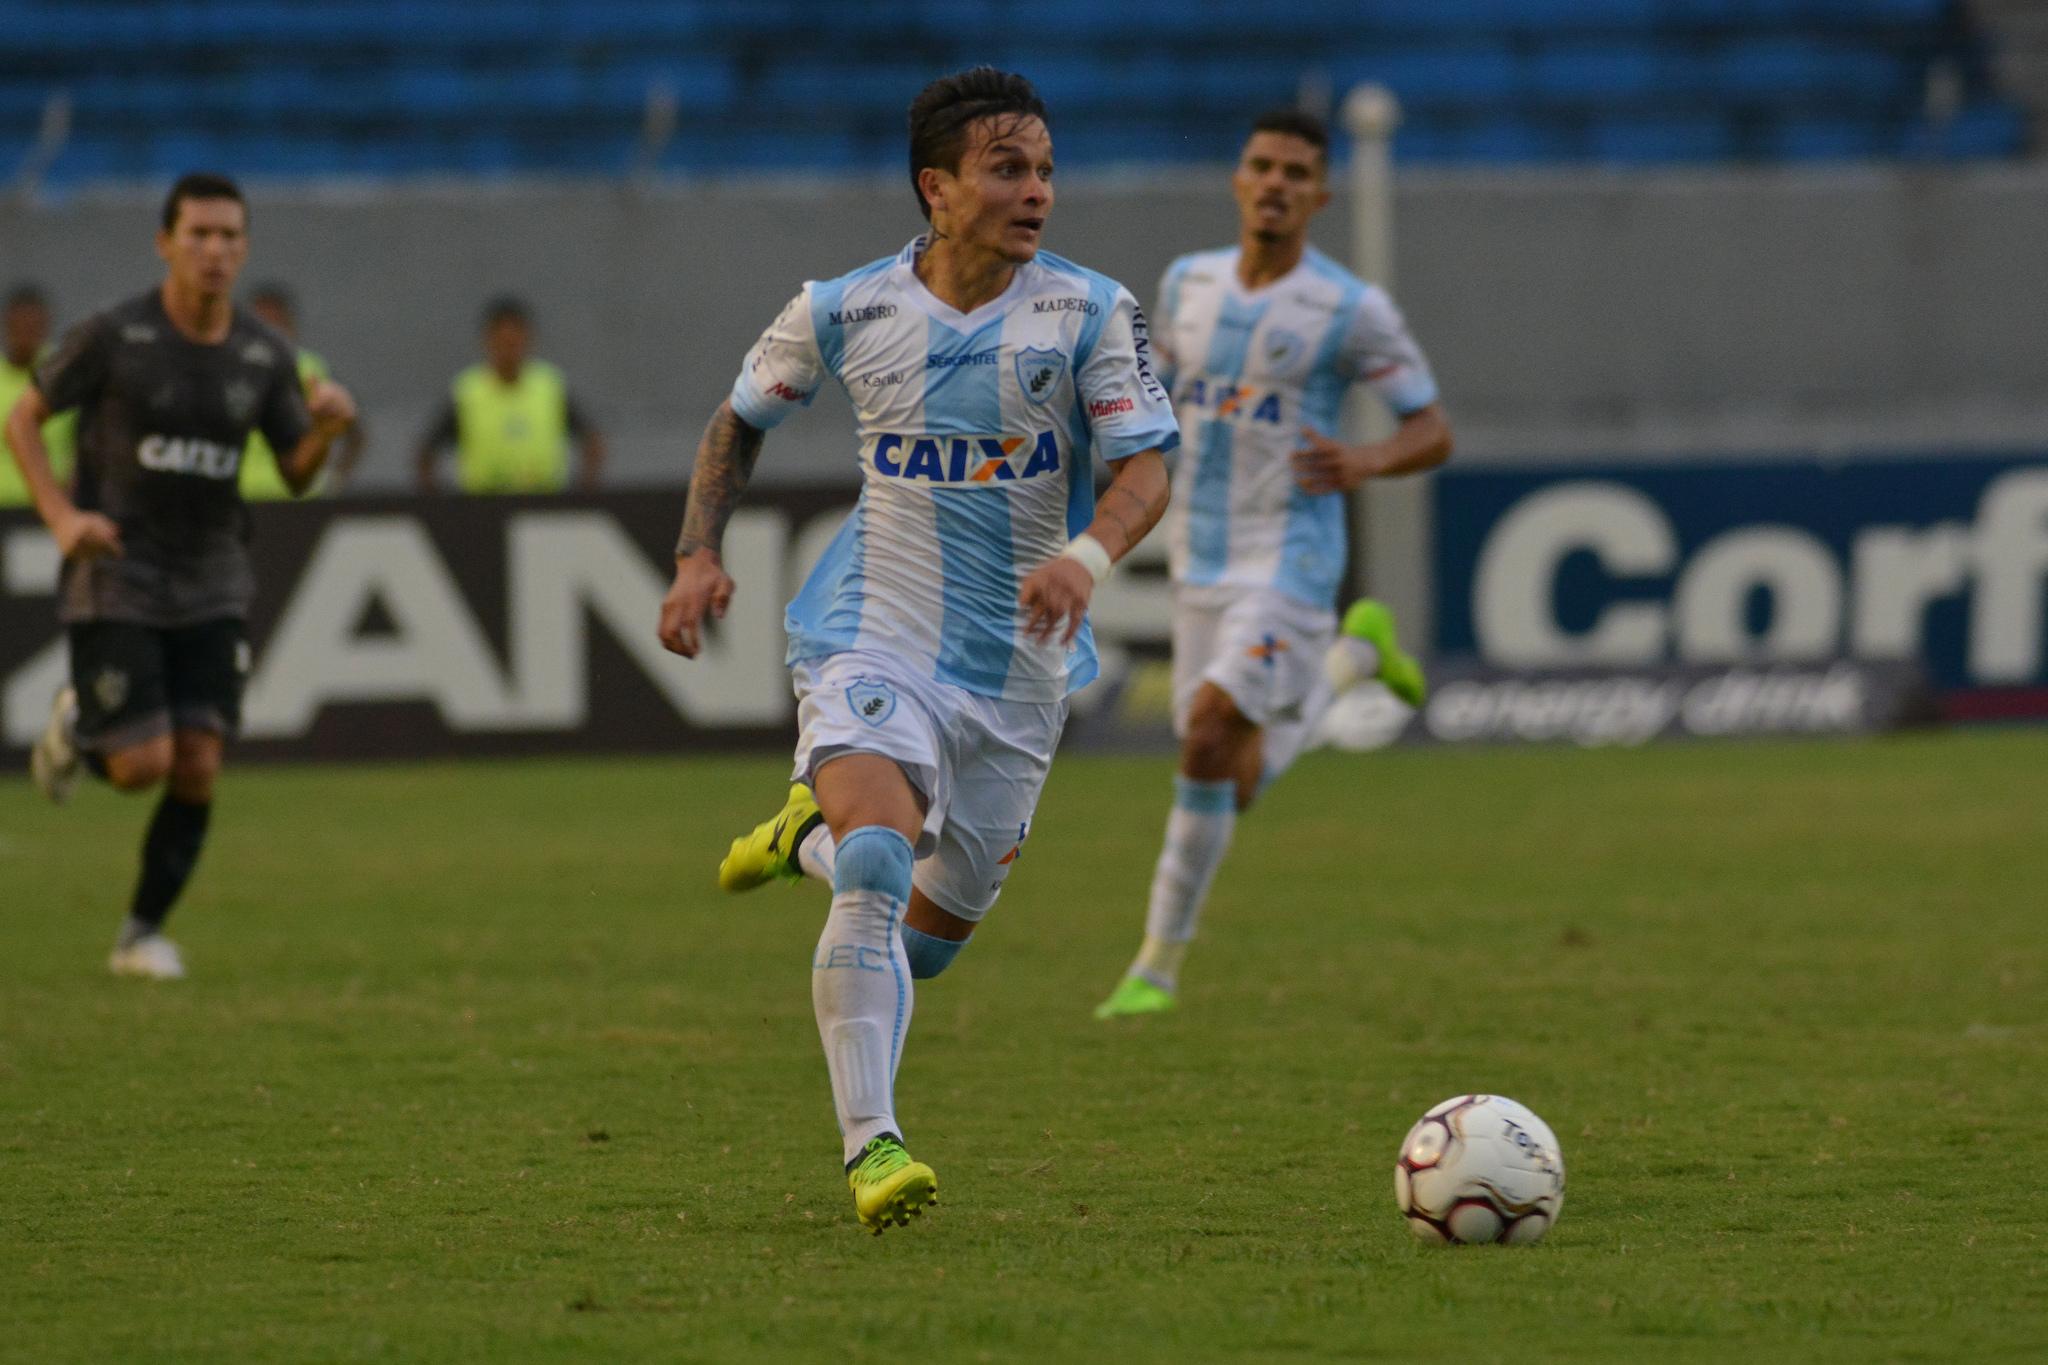 Londrina Artur Foto Gustavo Oliveira Londrina Esporte Clube